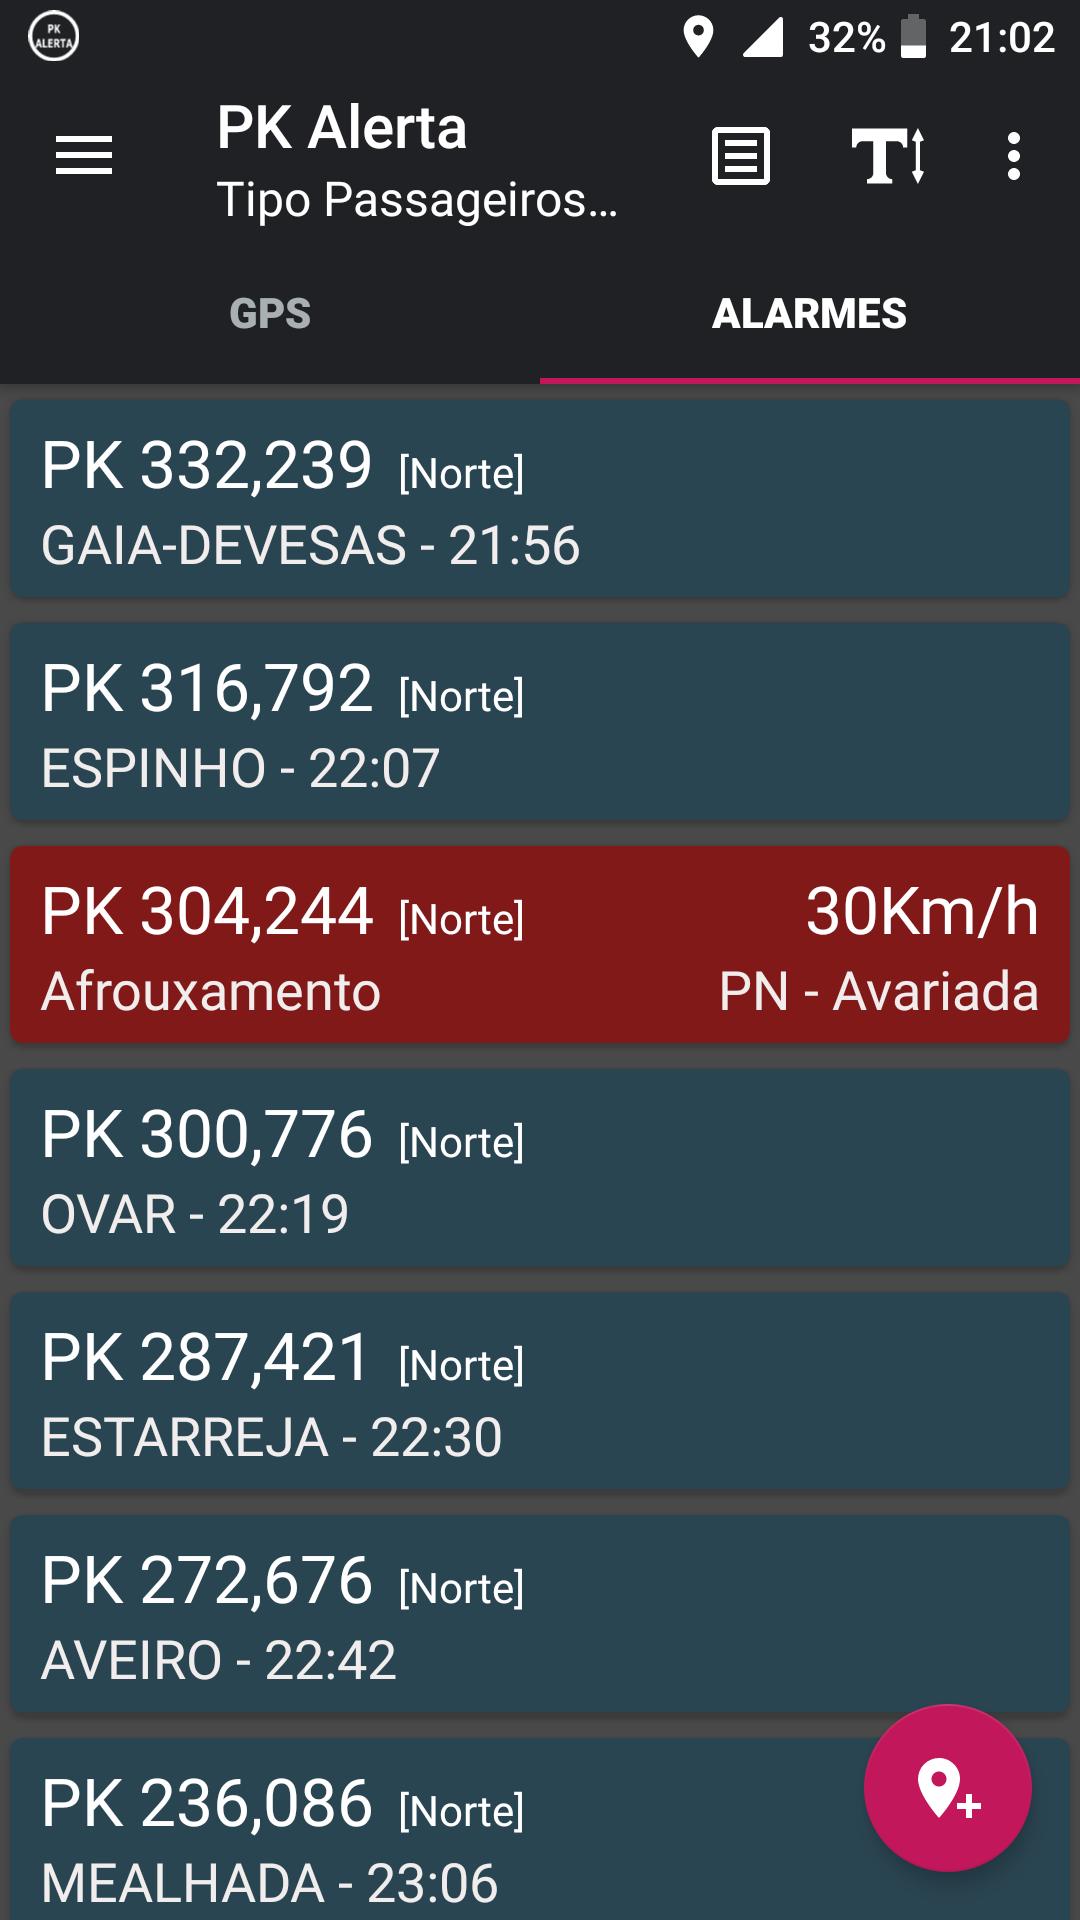 PK Alerta